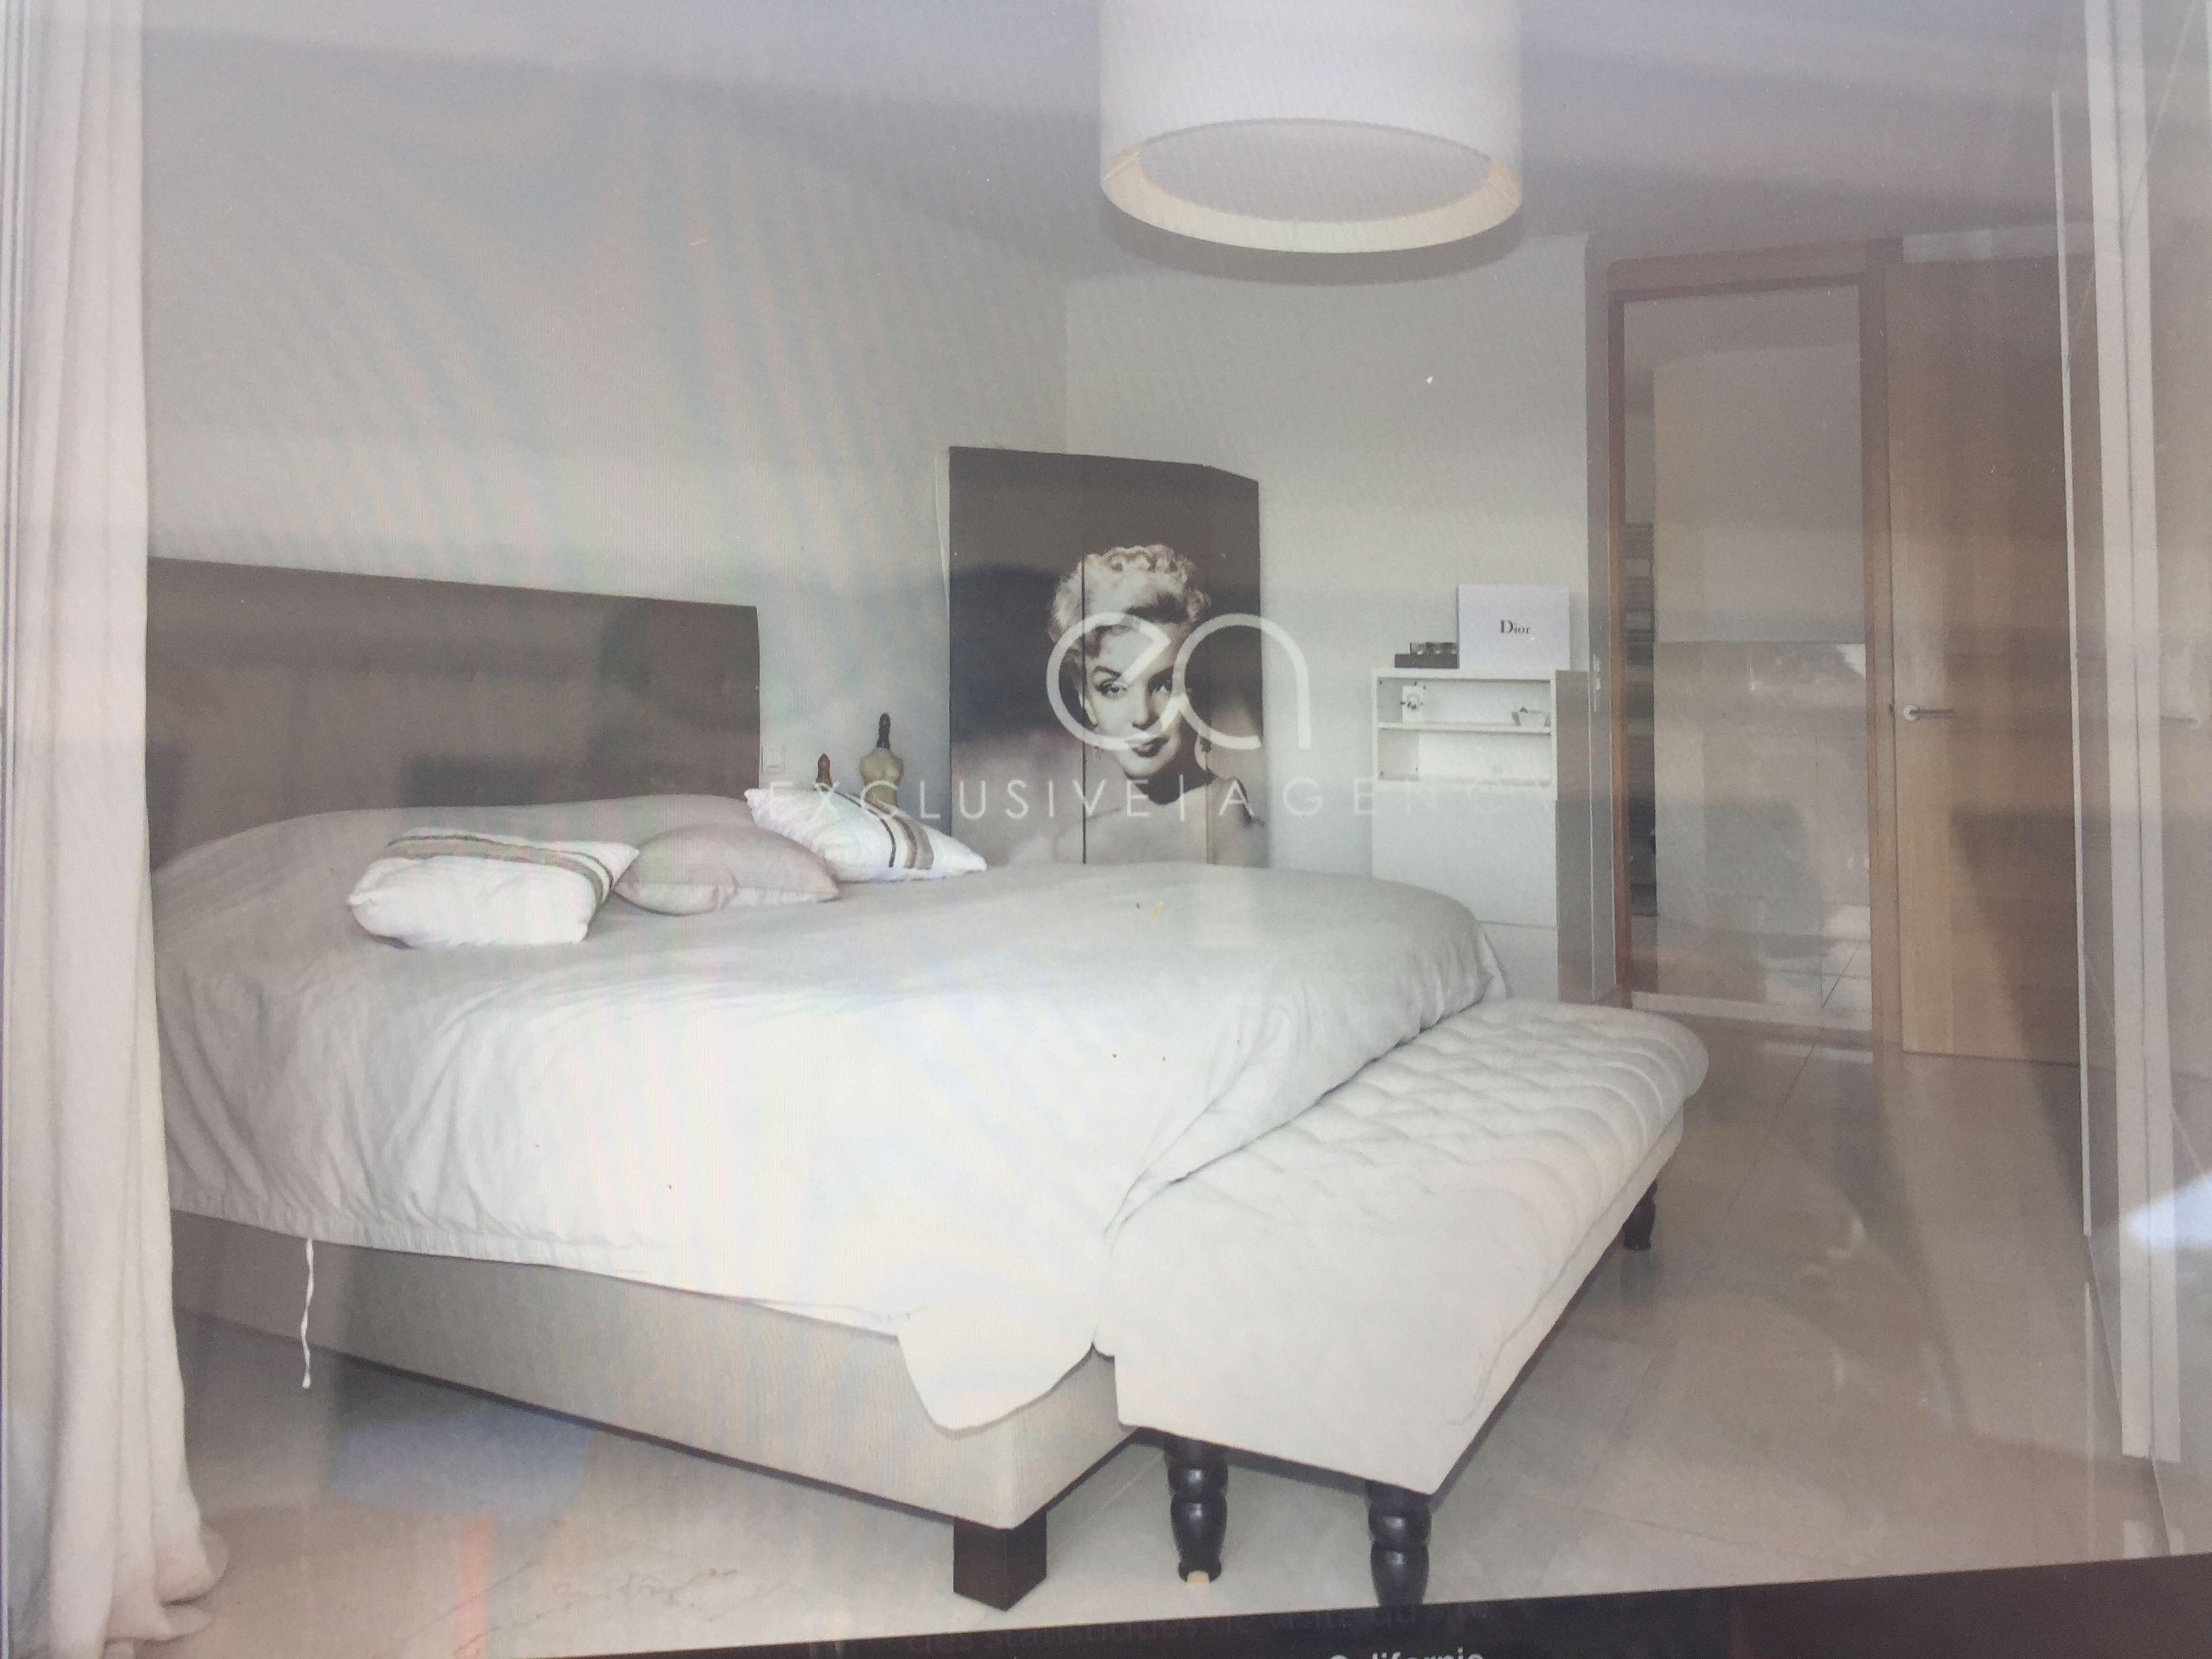 Bedroom interior hd pics pin by evelyne hd on interior pyjama lounge  pinterest  pyjamas